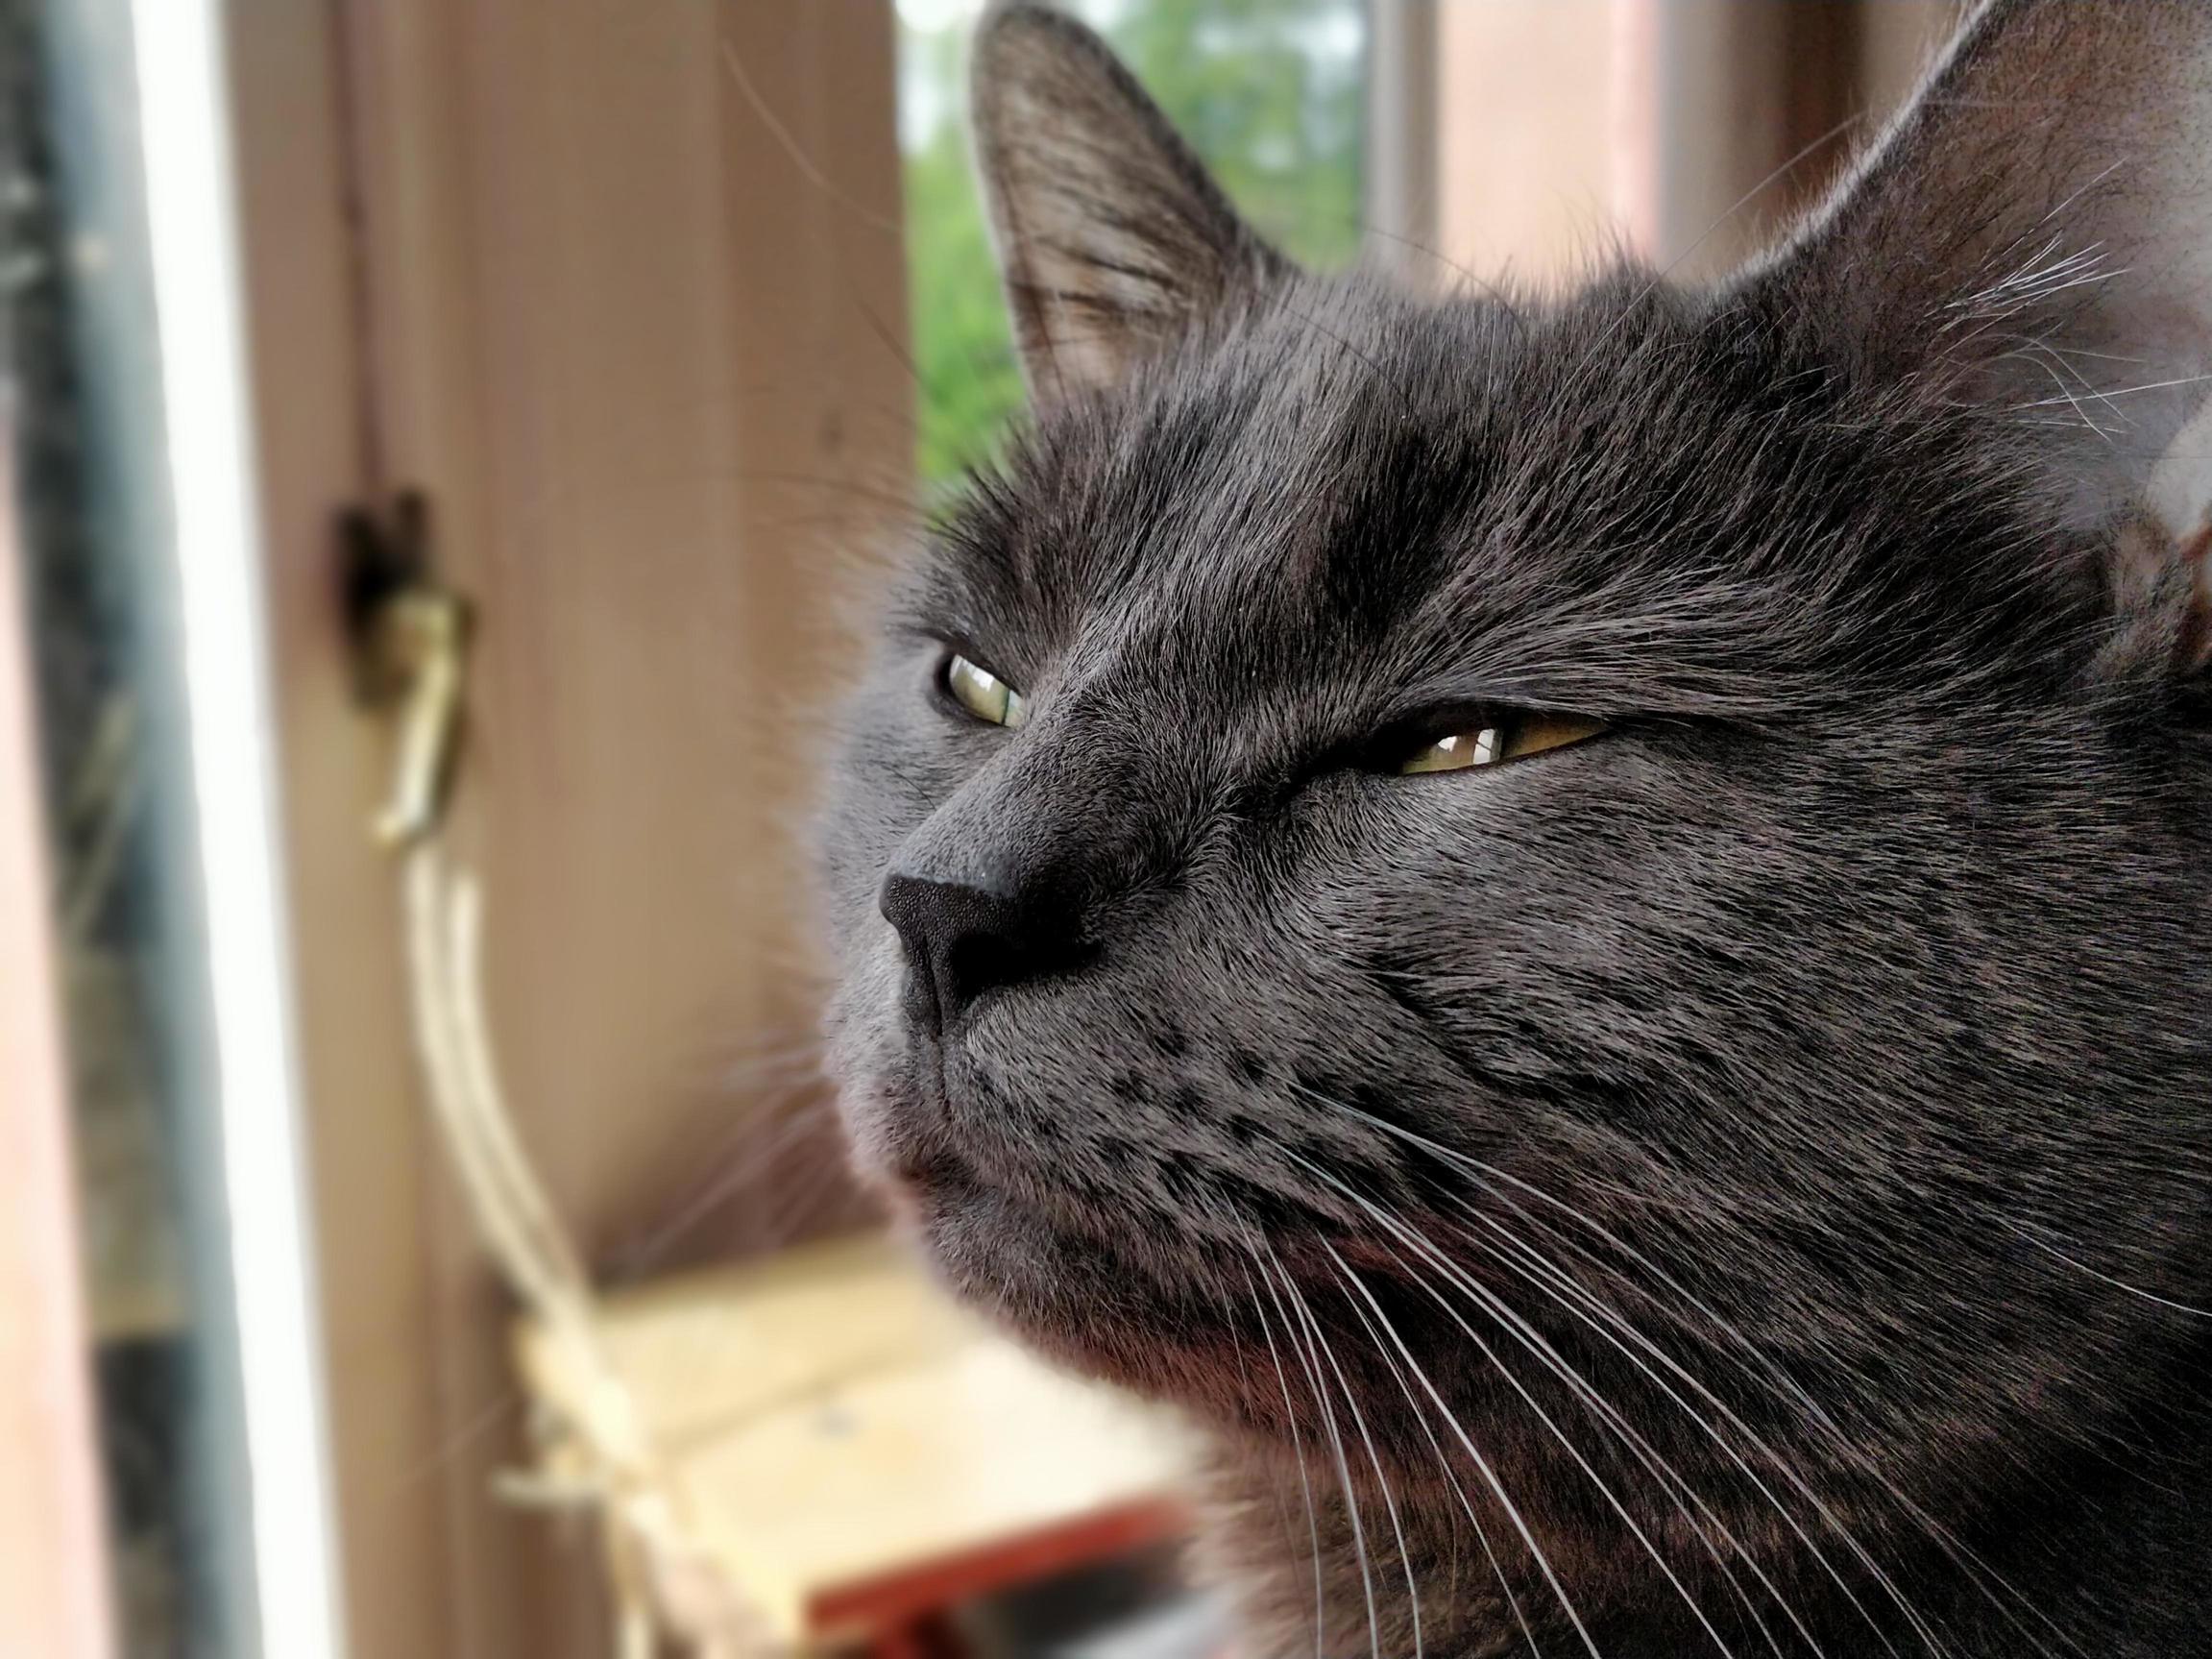 Smokey joe and his discerning stare